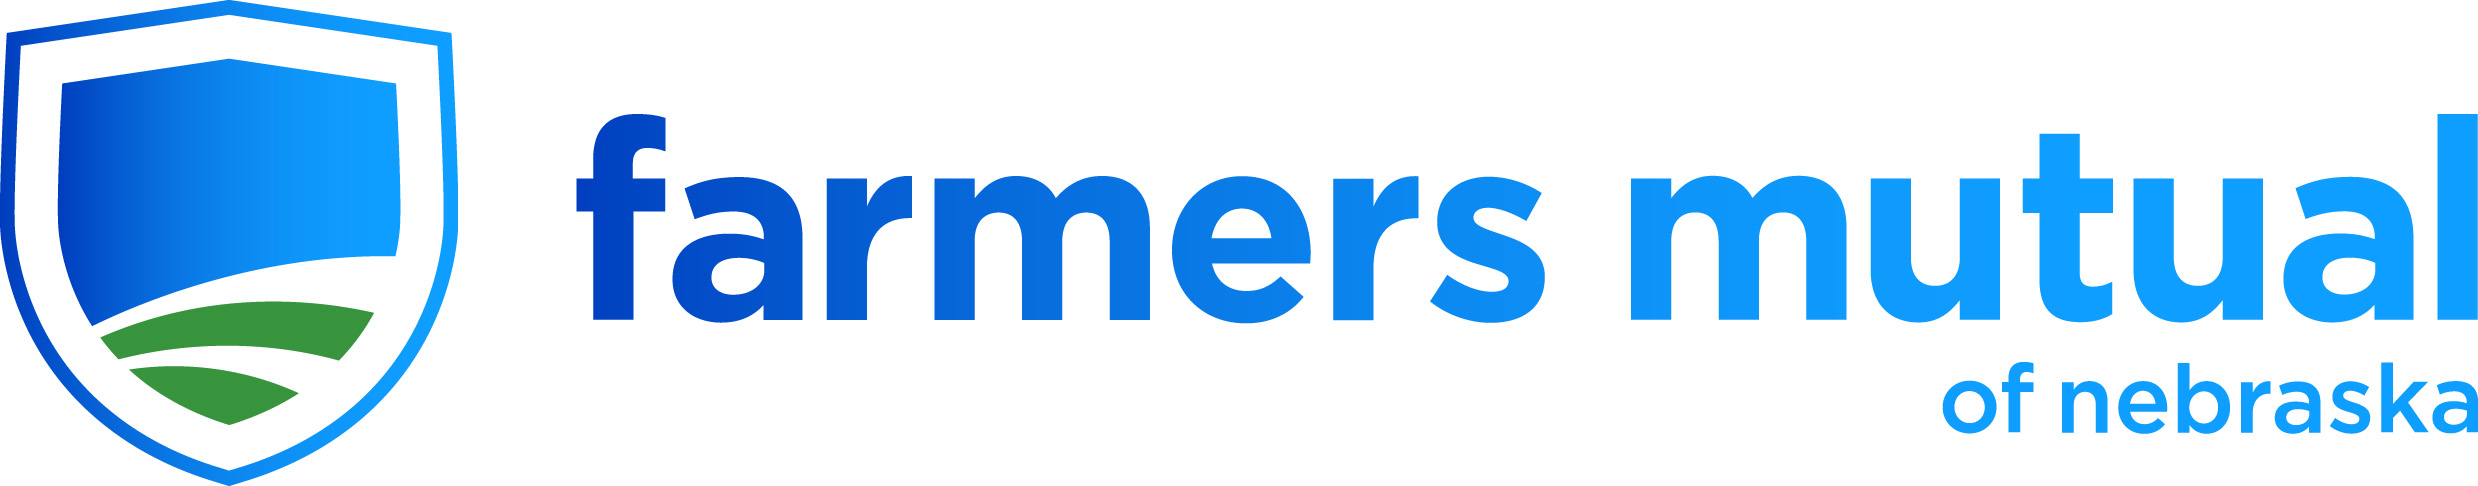 Farmers Mutual Insurance Company of Nebraska